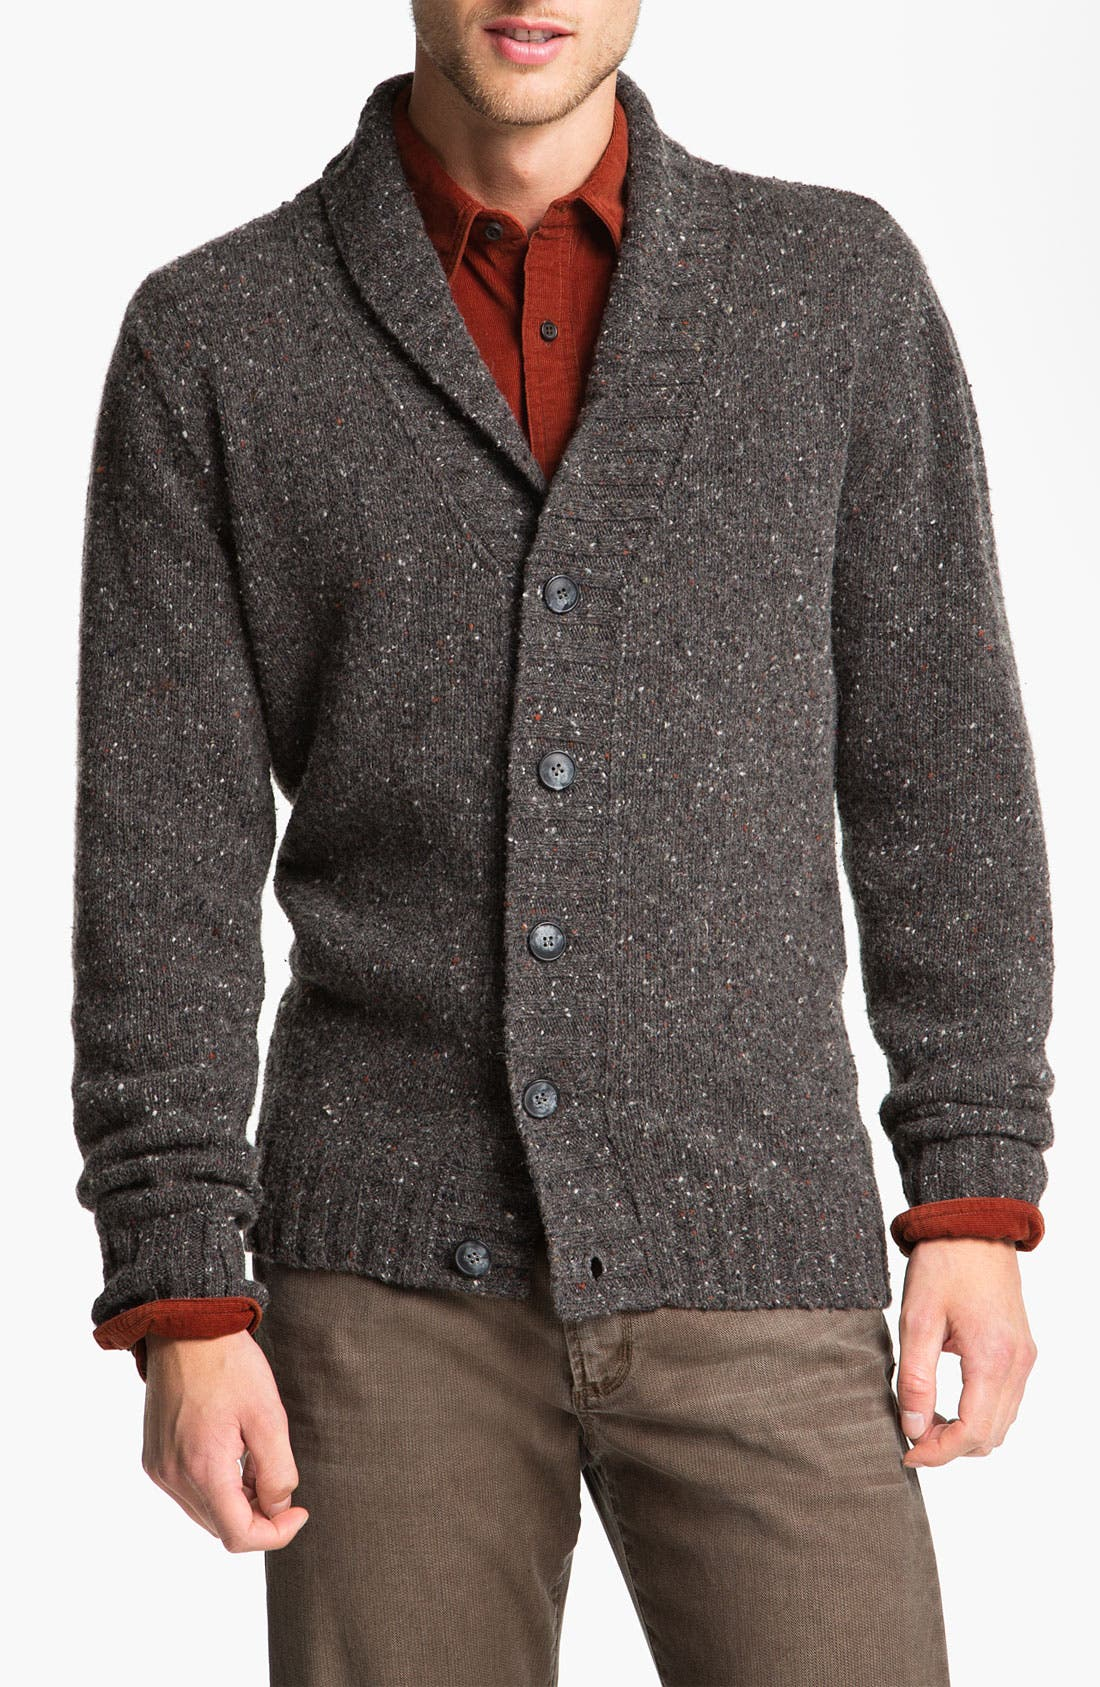 Main Image - Fiesole Shawl Collar Wool Blend Cardigan